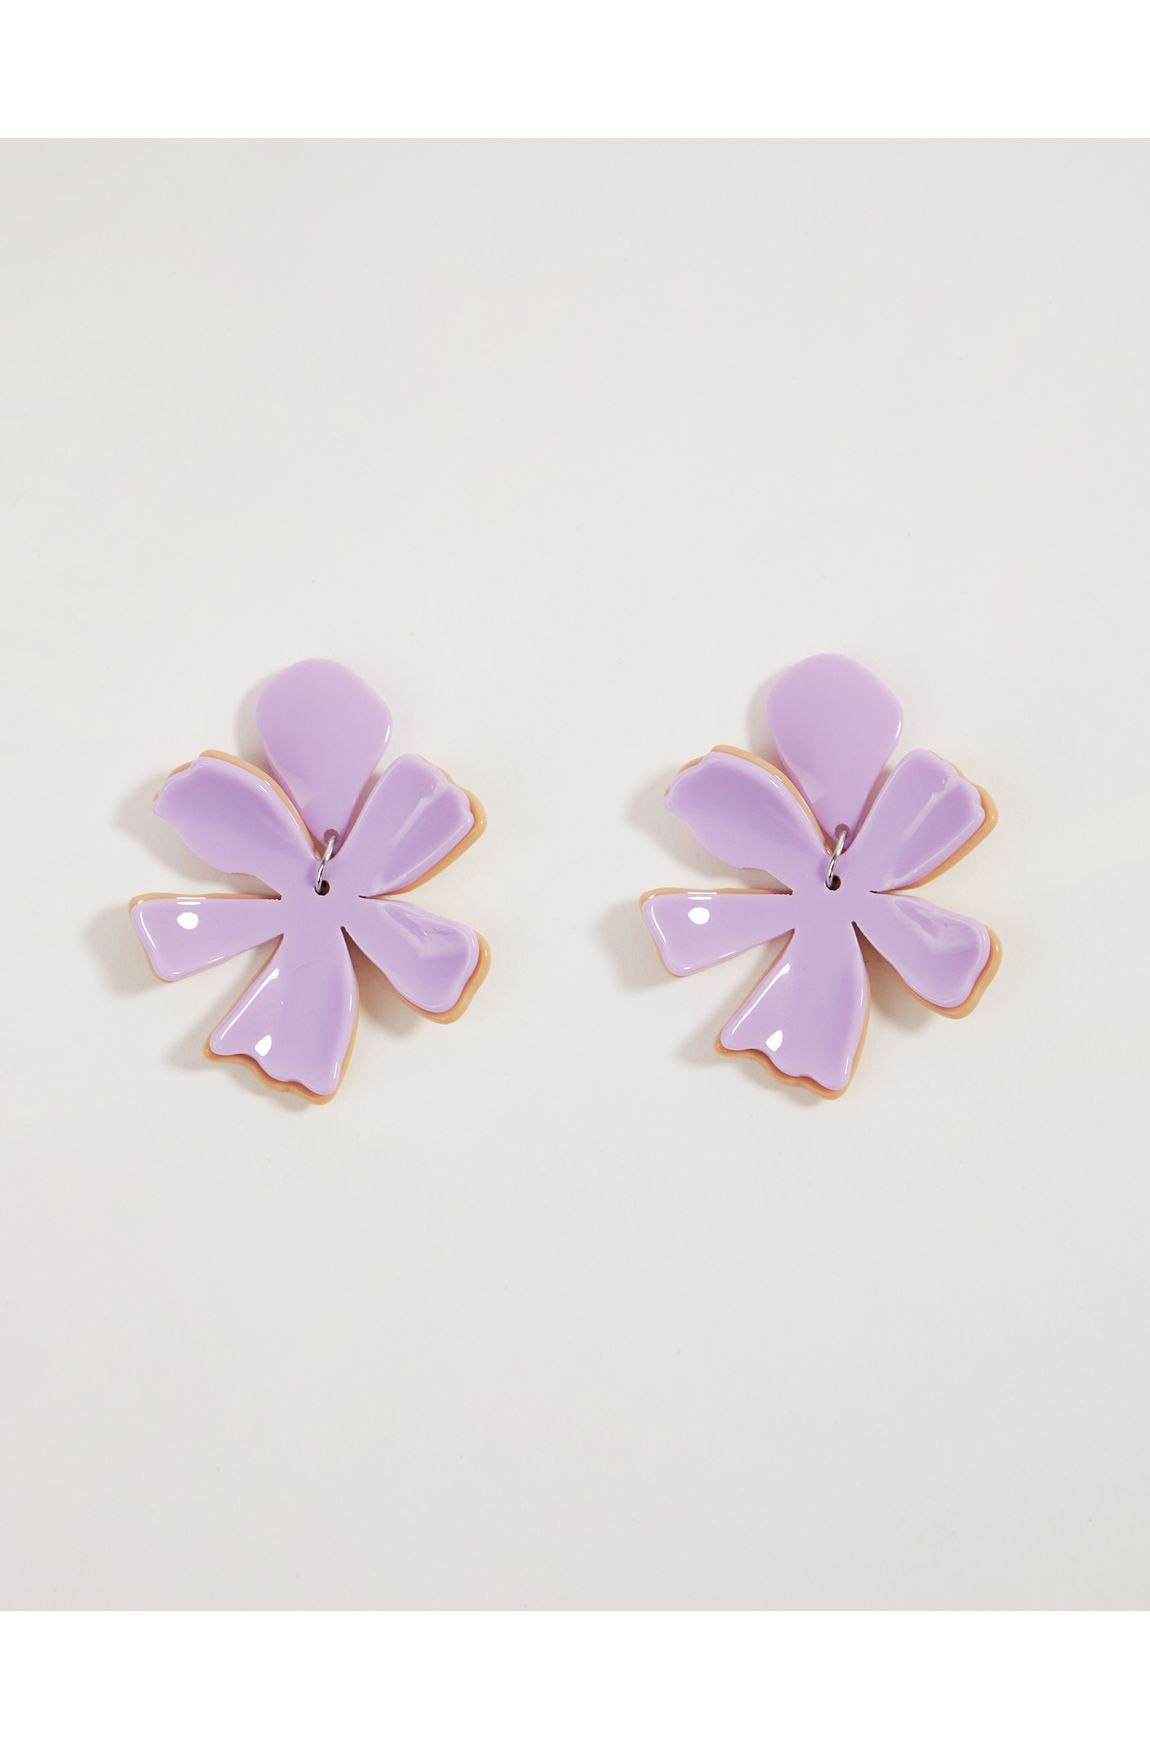 Brinco flor dupla lilas e nude